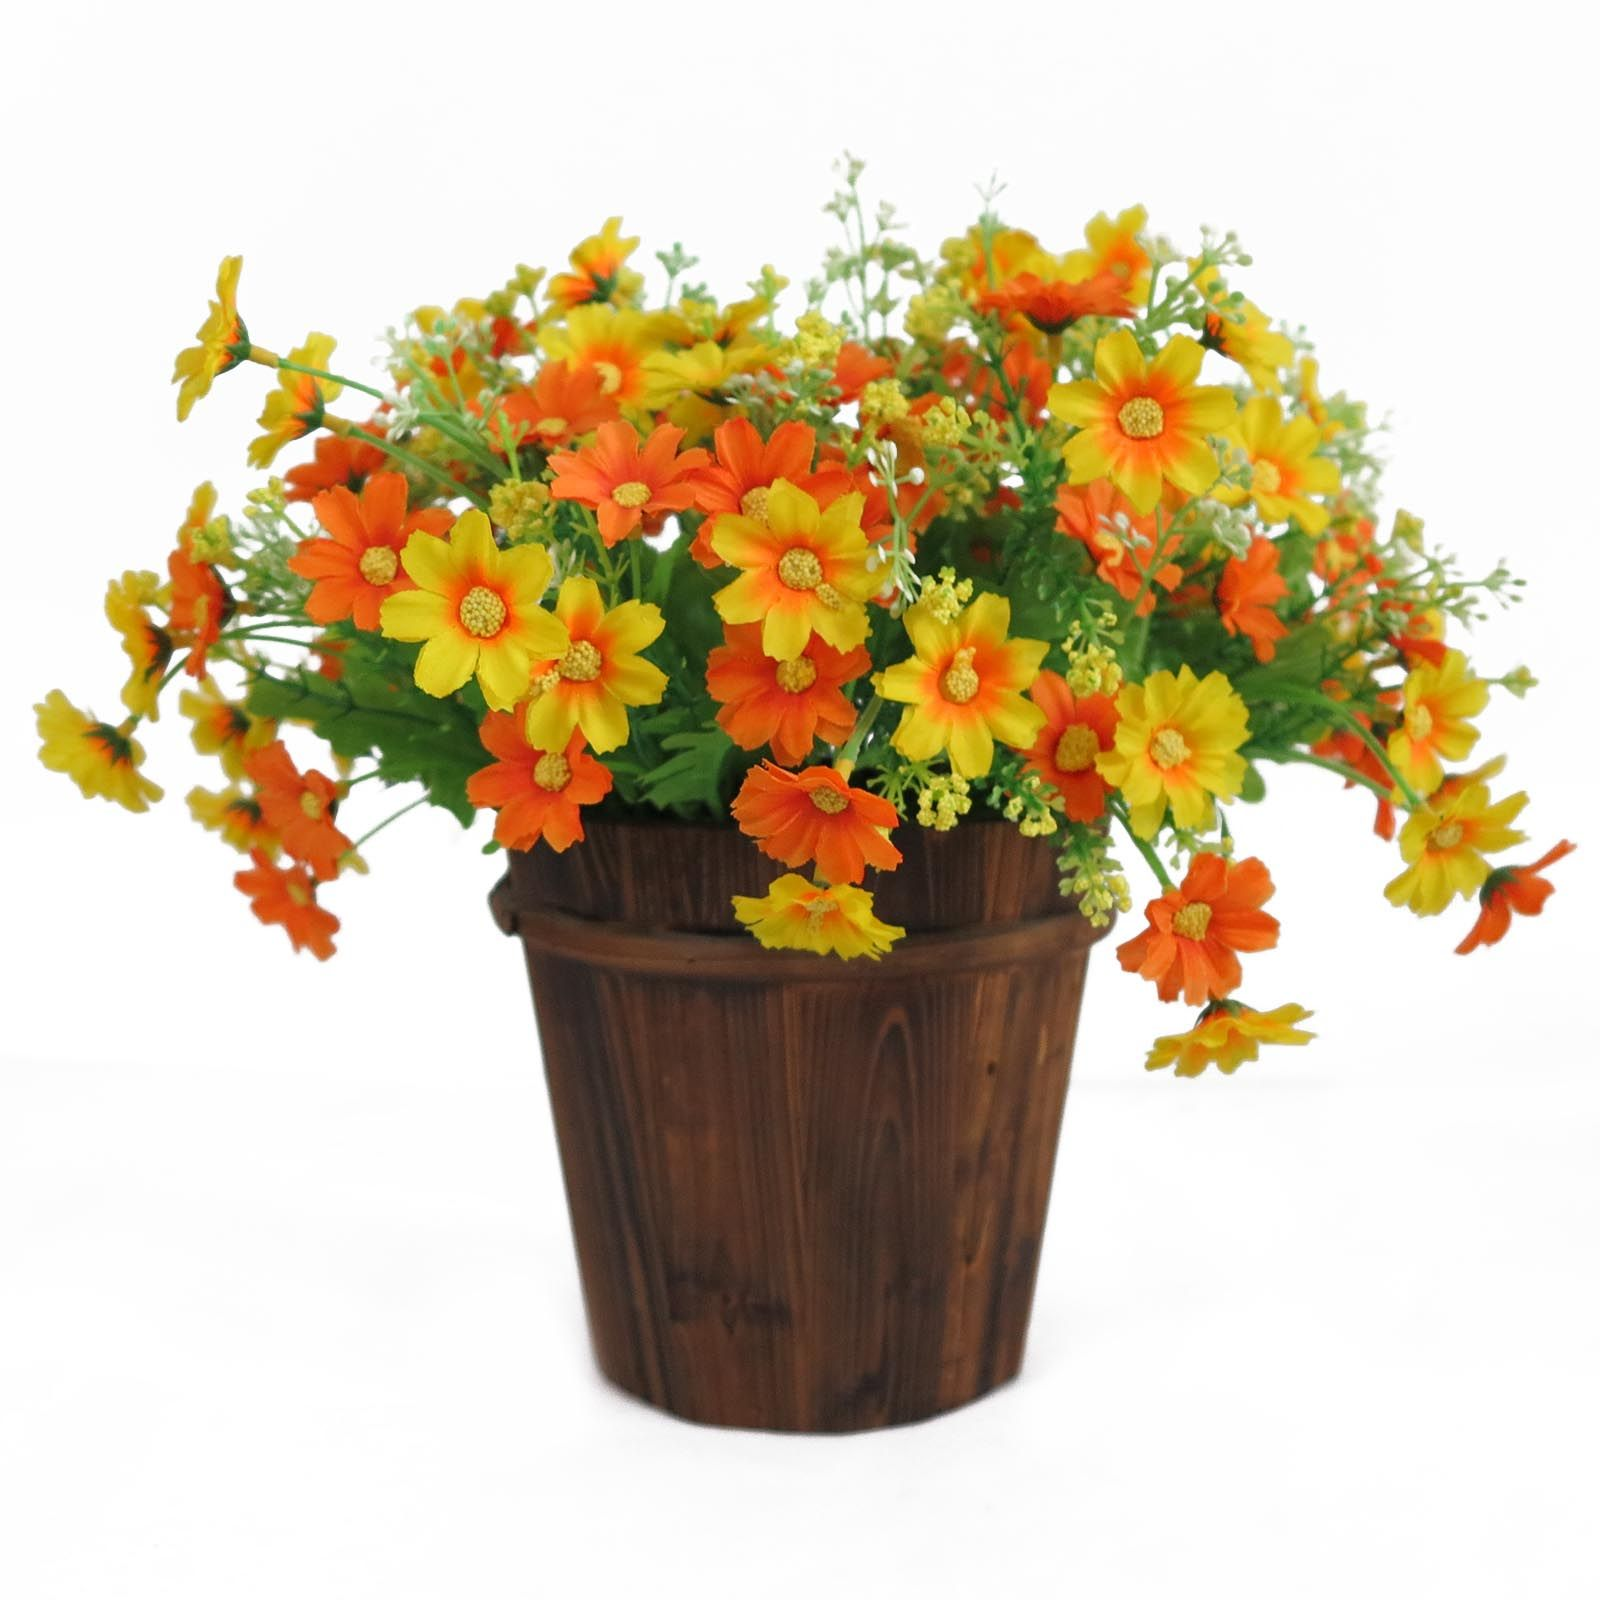 Artificial Chrysanthemum Daisy Flower Bush Bunch Hanging Basket Vase